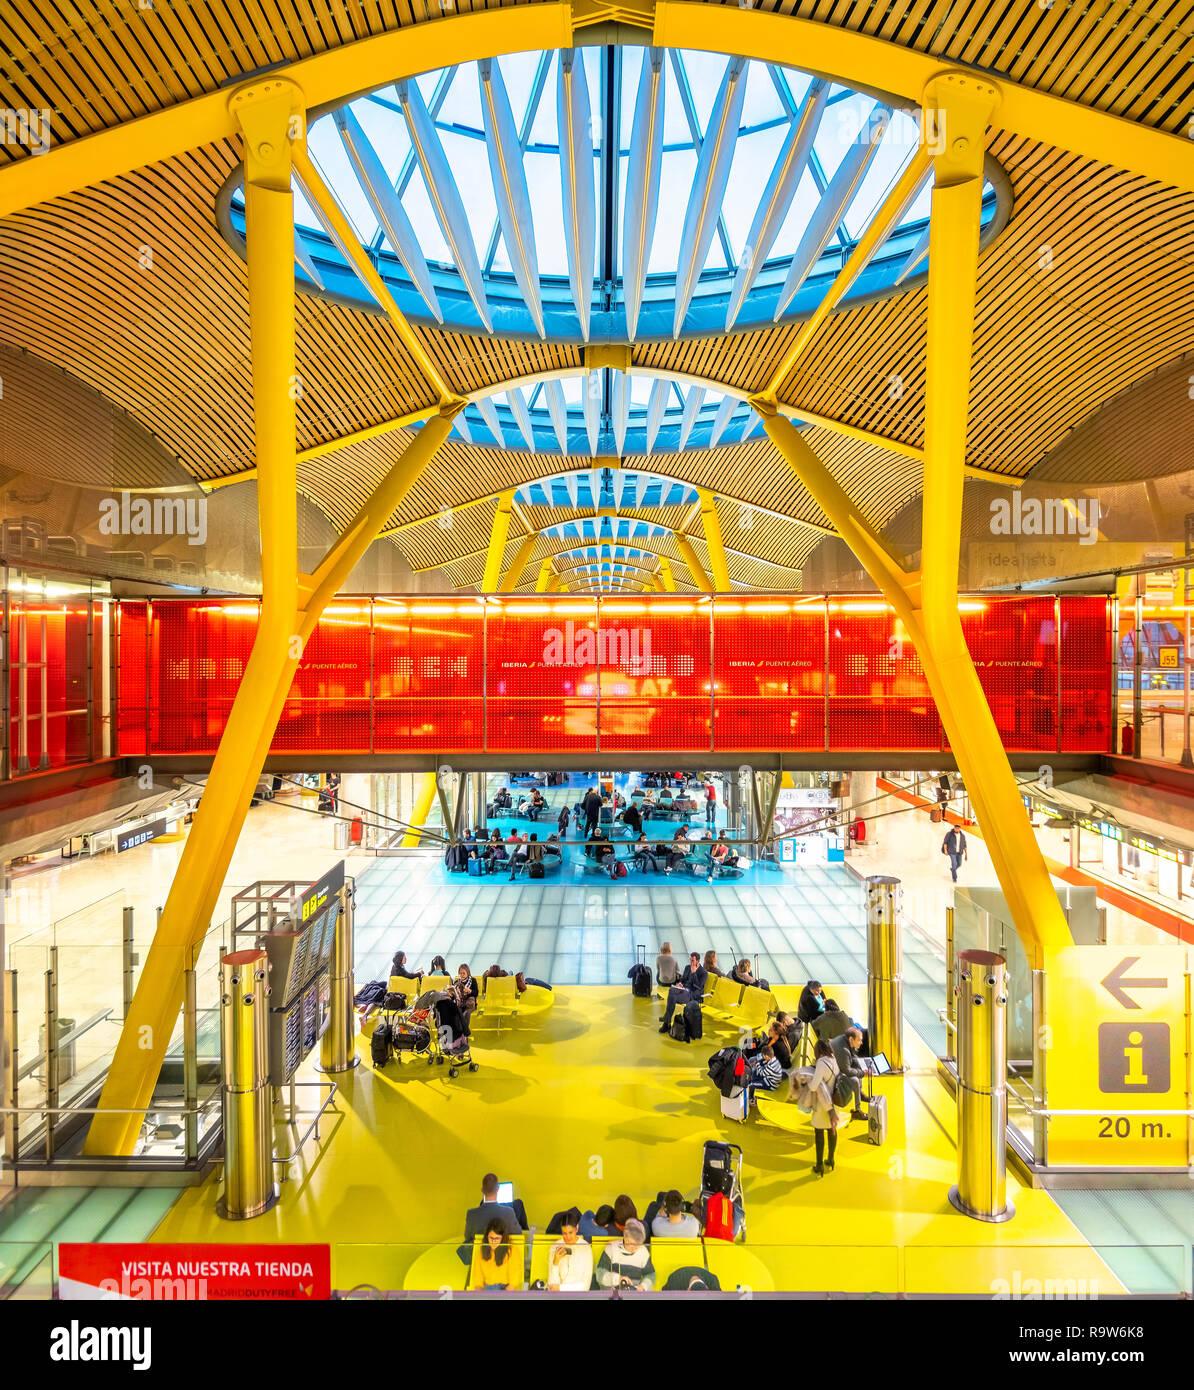 Madrid Airport Terminal 4 dell'aeroporto di Madrid Barajas progettato da Antonio Lamela, Richard Rogers, Aeropuerto Adolfo Suárez Madrid-Barajas. Foto Stock